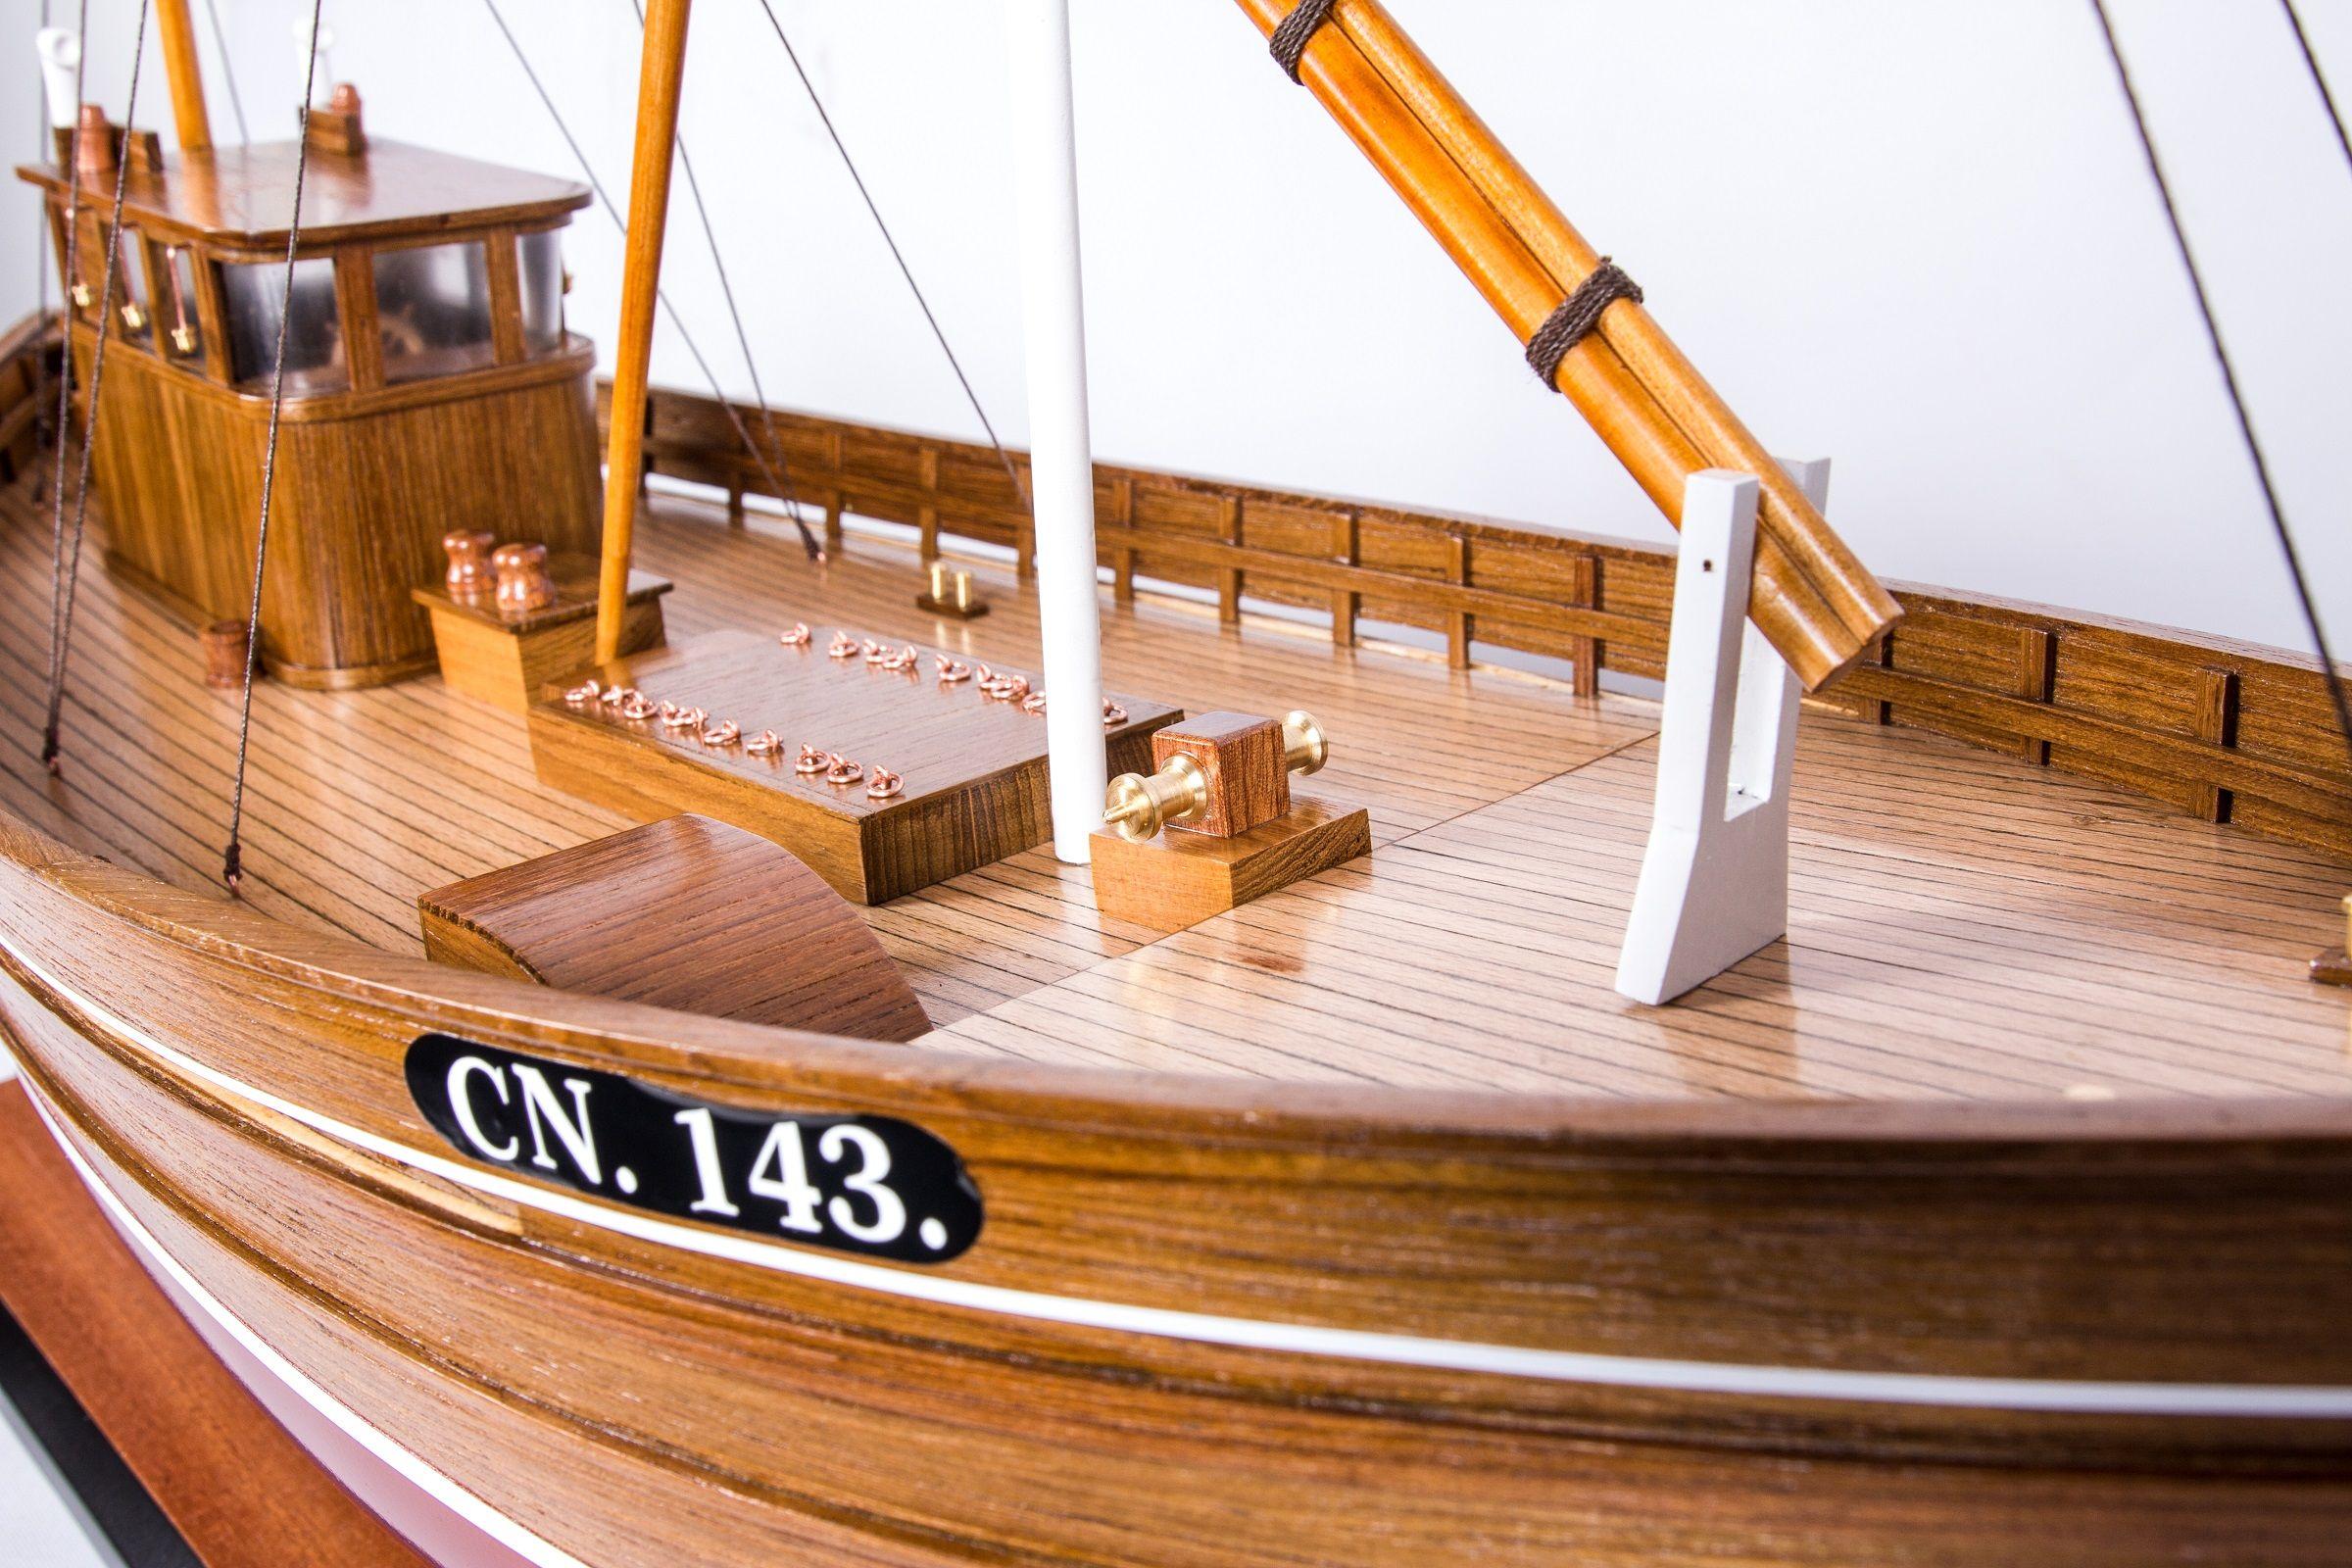 1666-9368-Amalthea-CN-143-Model-Boat